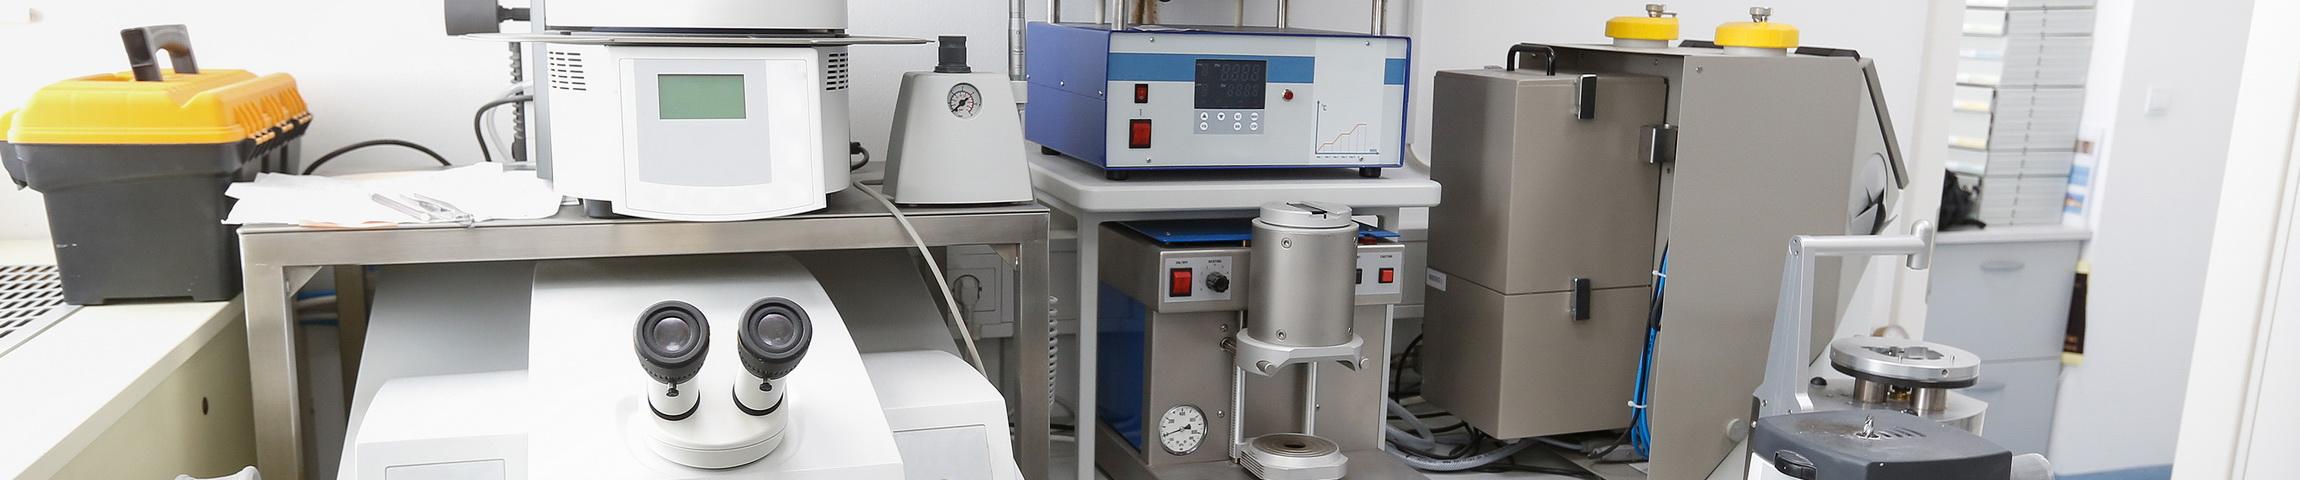 Labor und Medizintechnik...